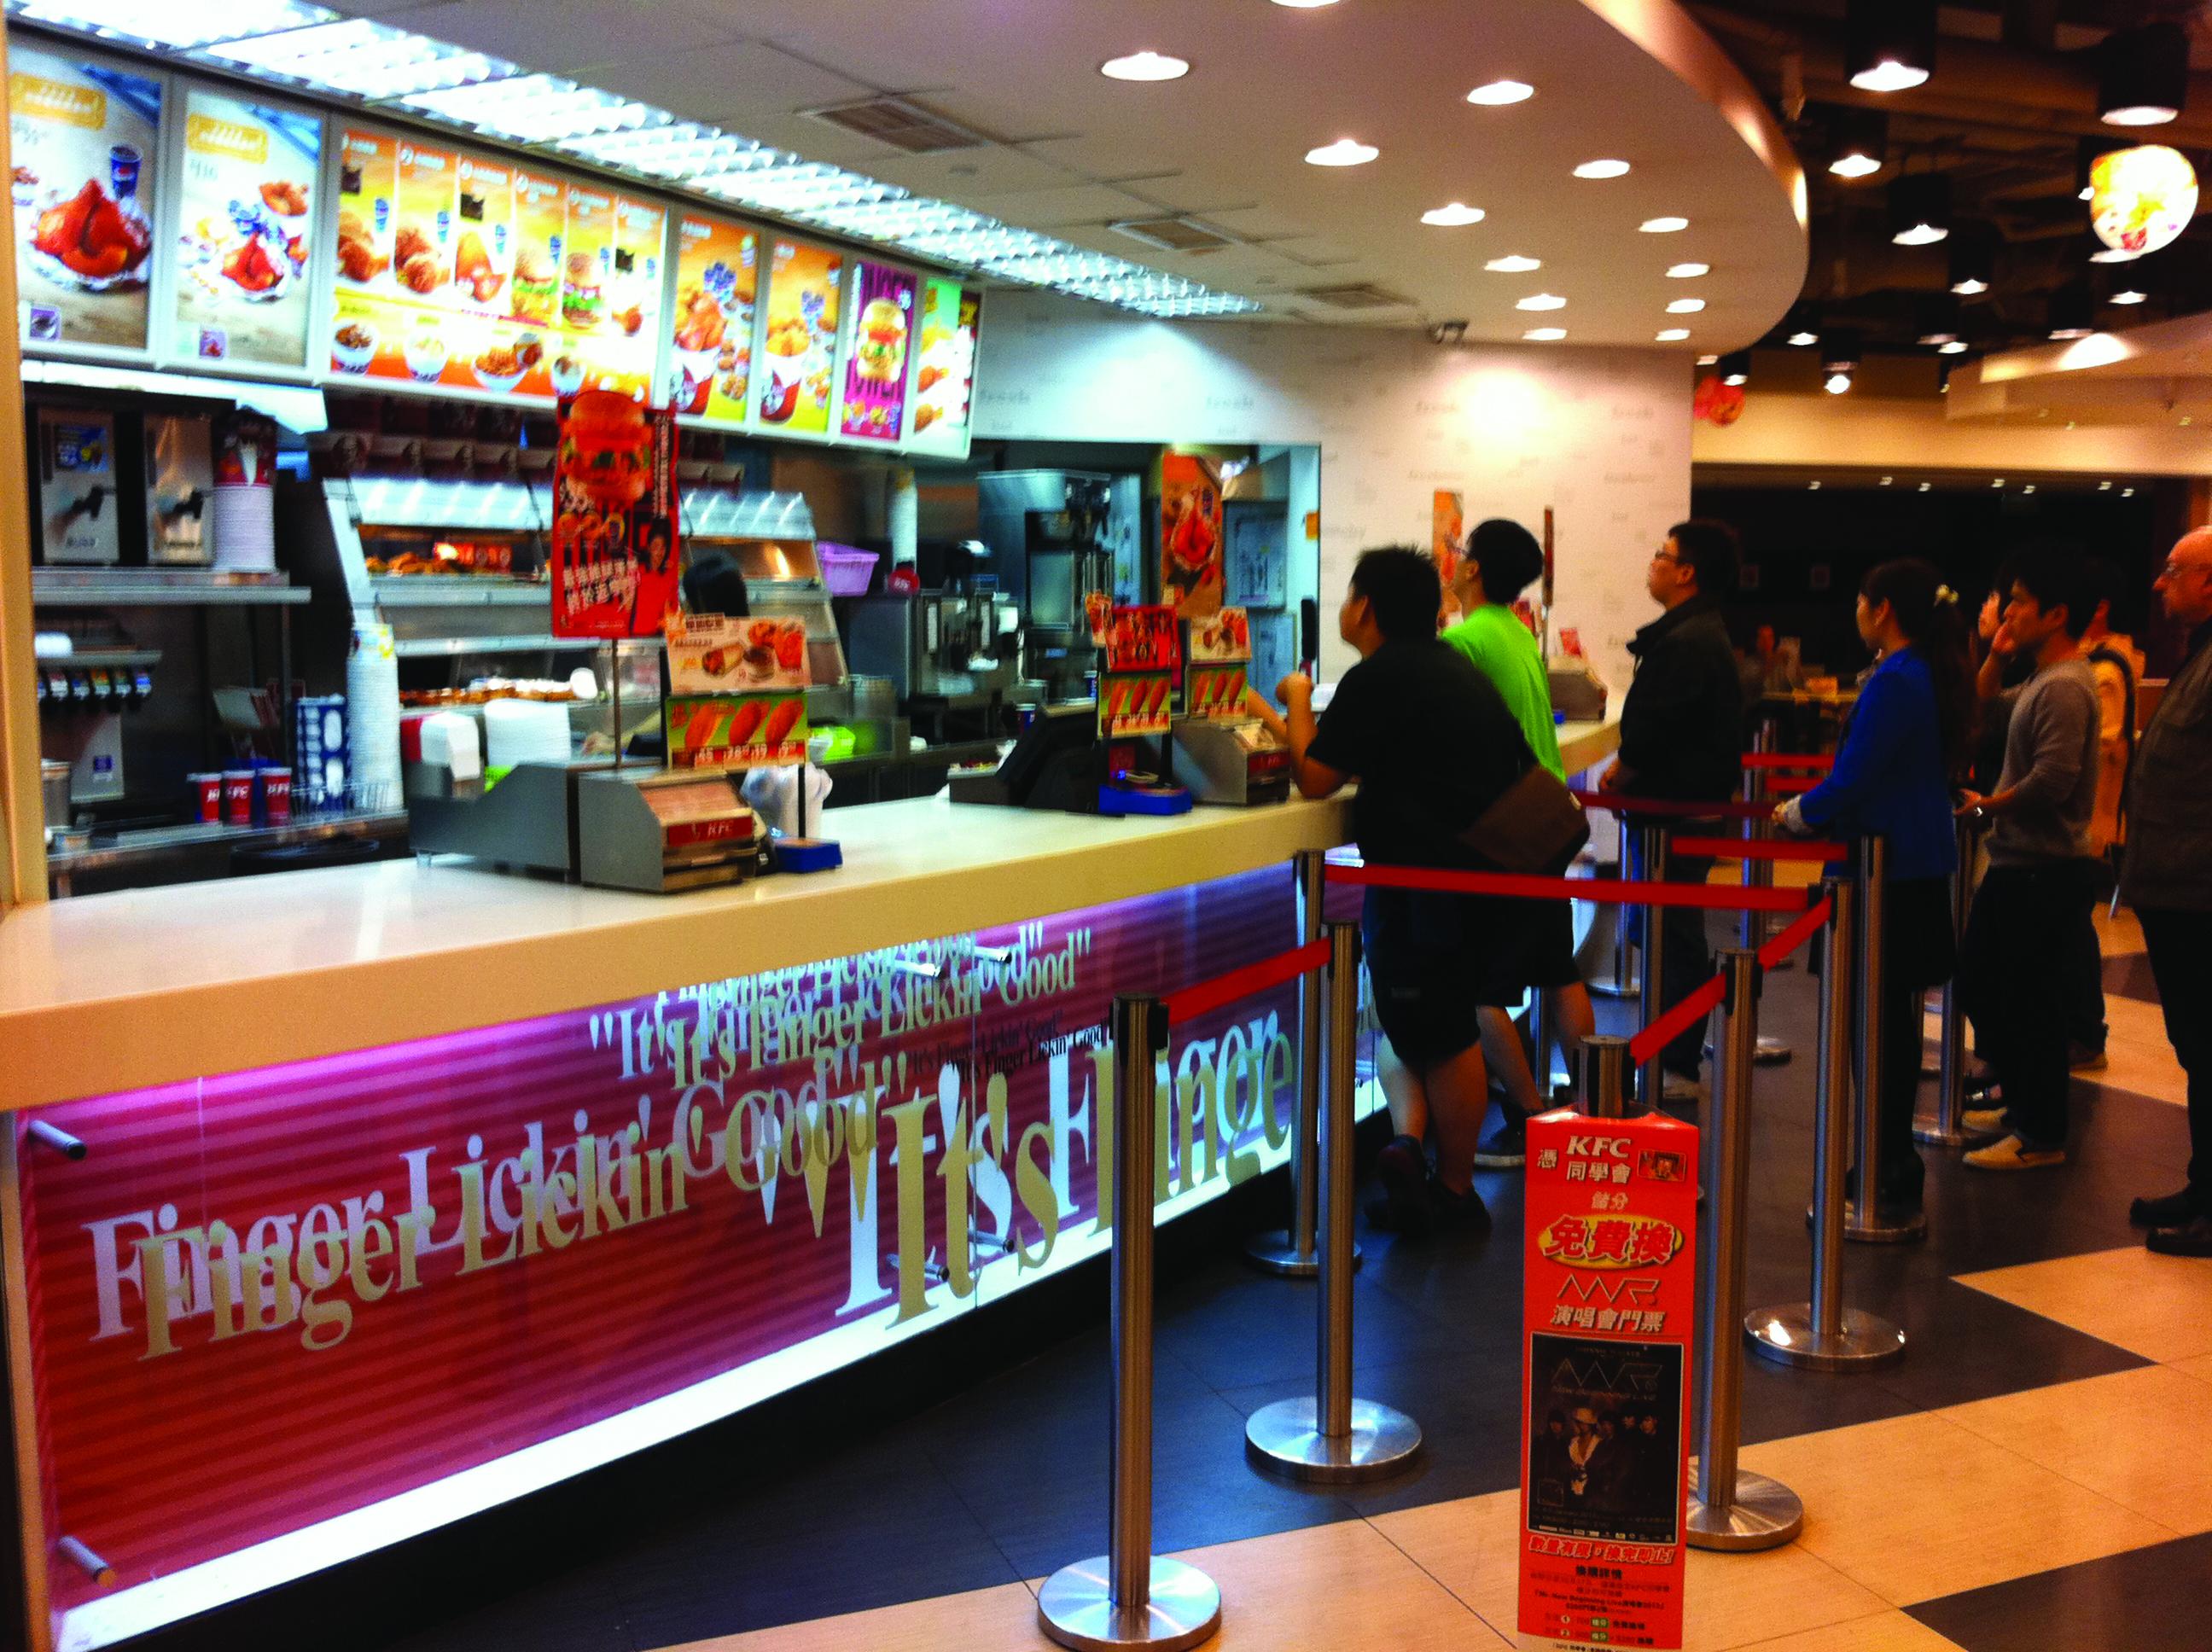 hk_admiralty_centre_kfc_restaurant_service_counter_nov-2012